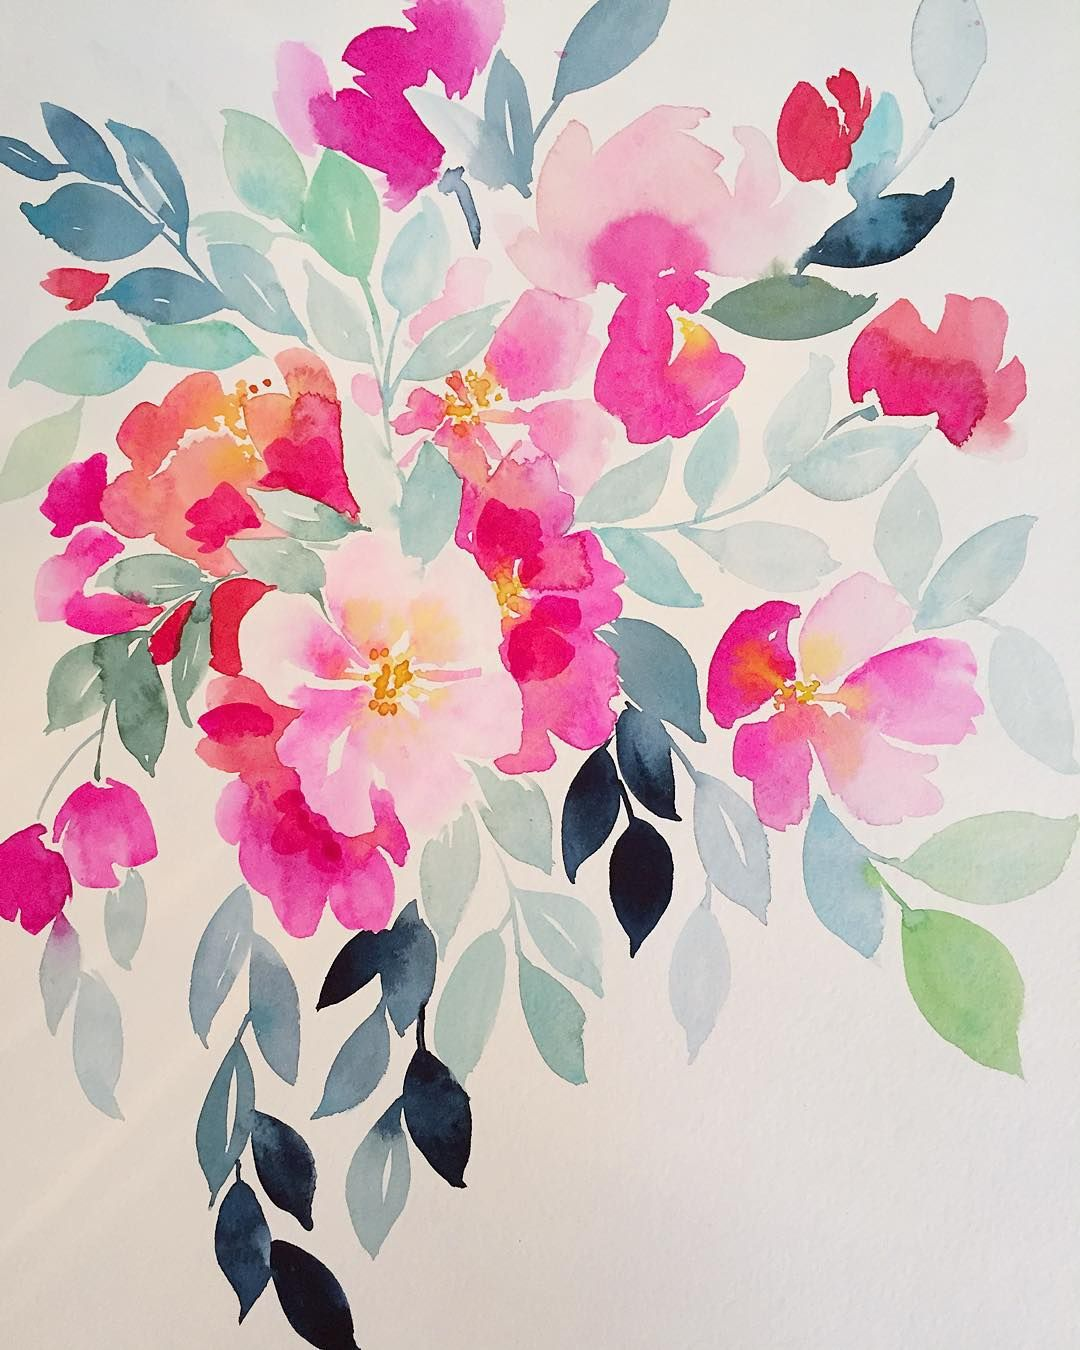 Doodles jbletteringdesign watercolor pinterest for Watercolor flower images